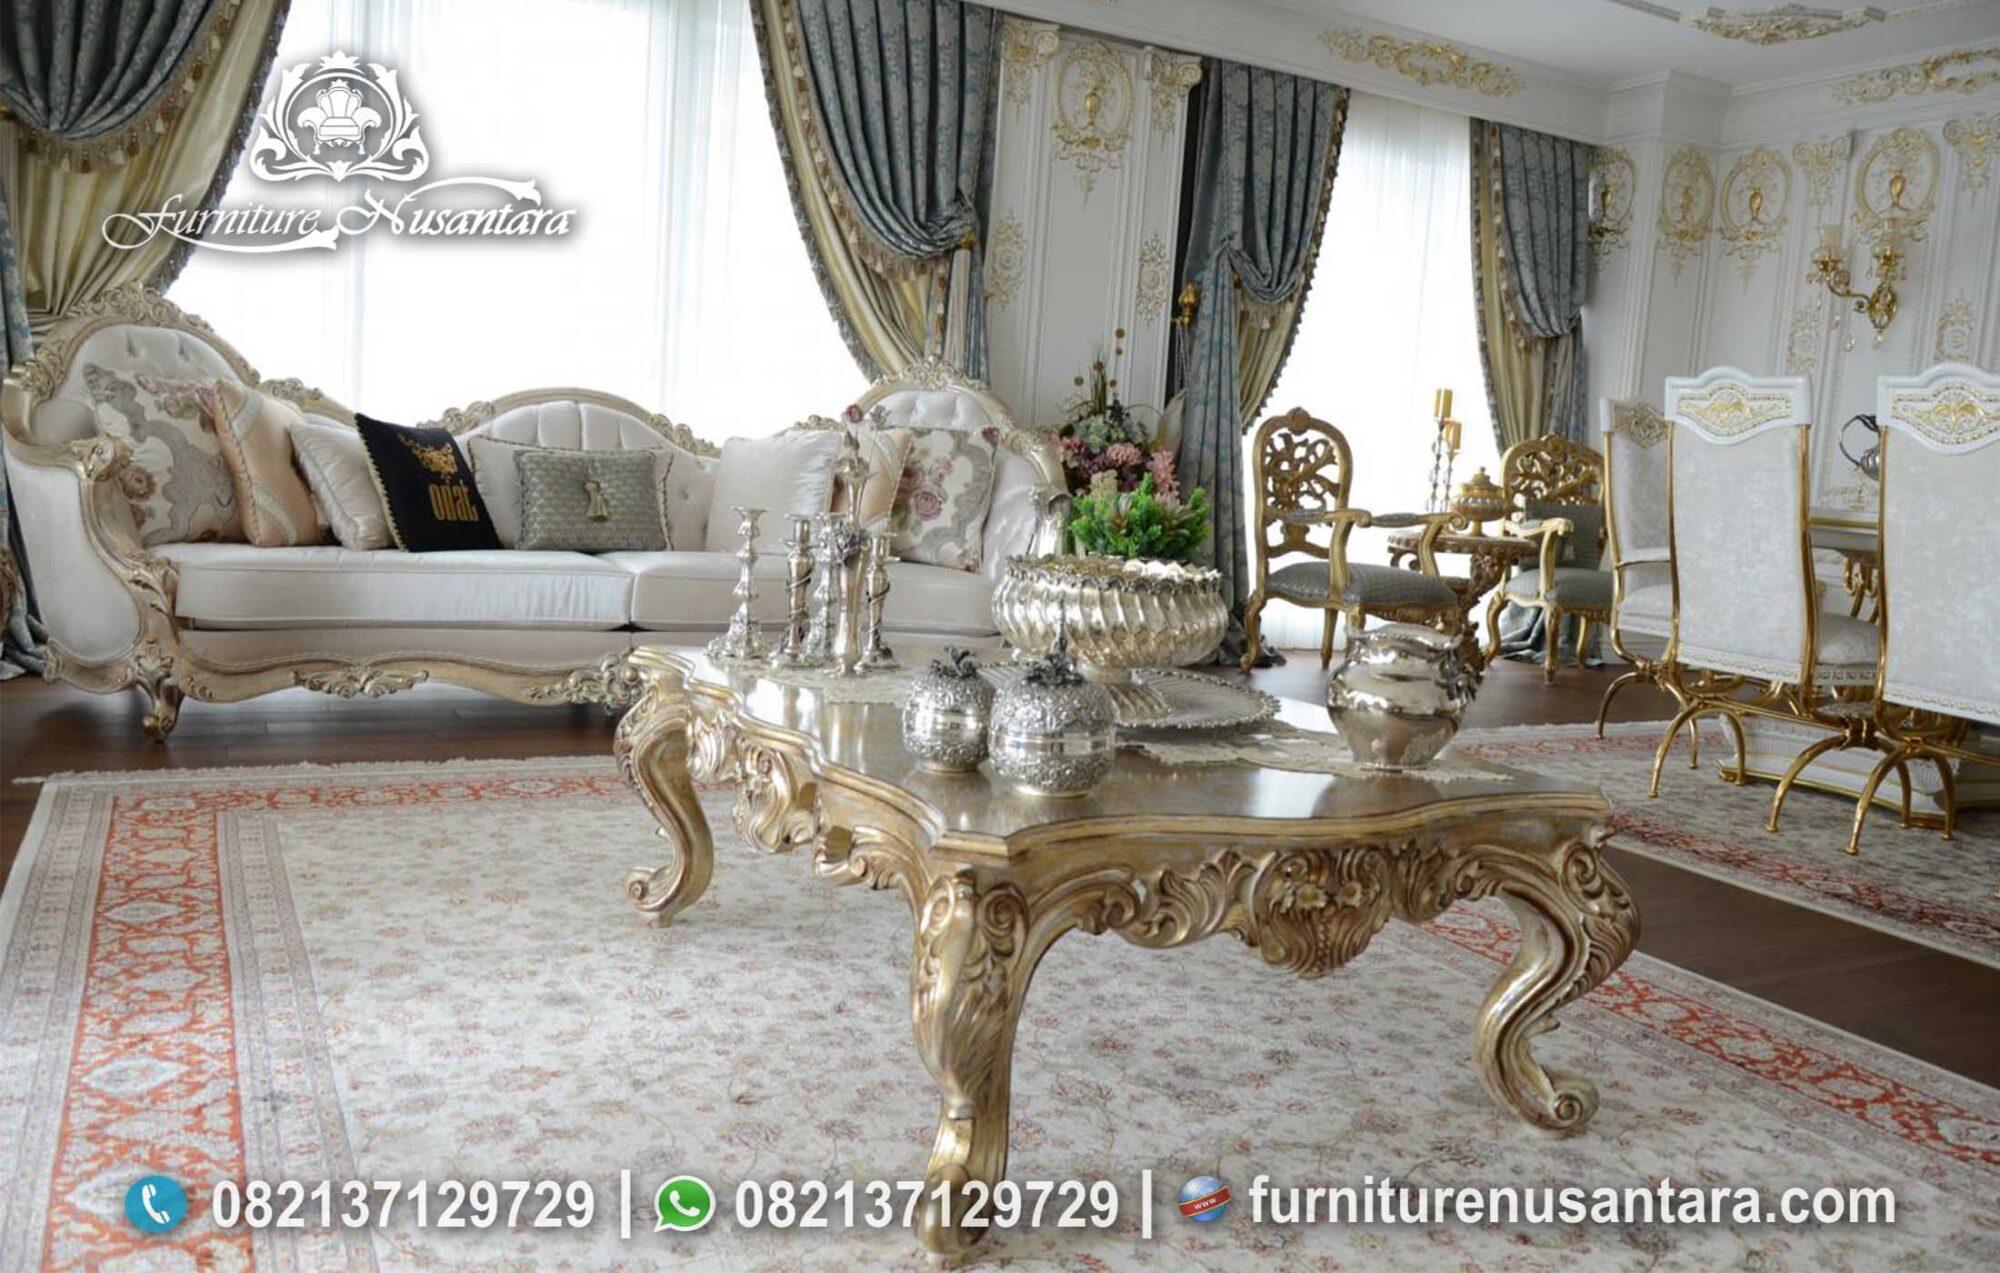 Sofa Ukir Jepara Luxury Desain ST-04, Furniture Nusantara